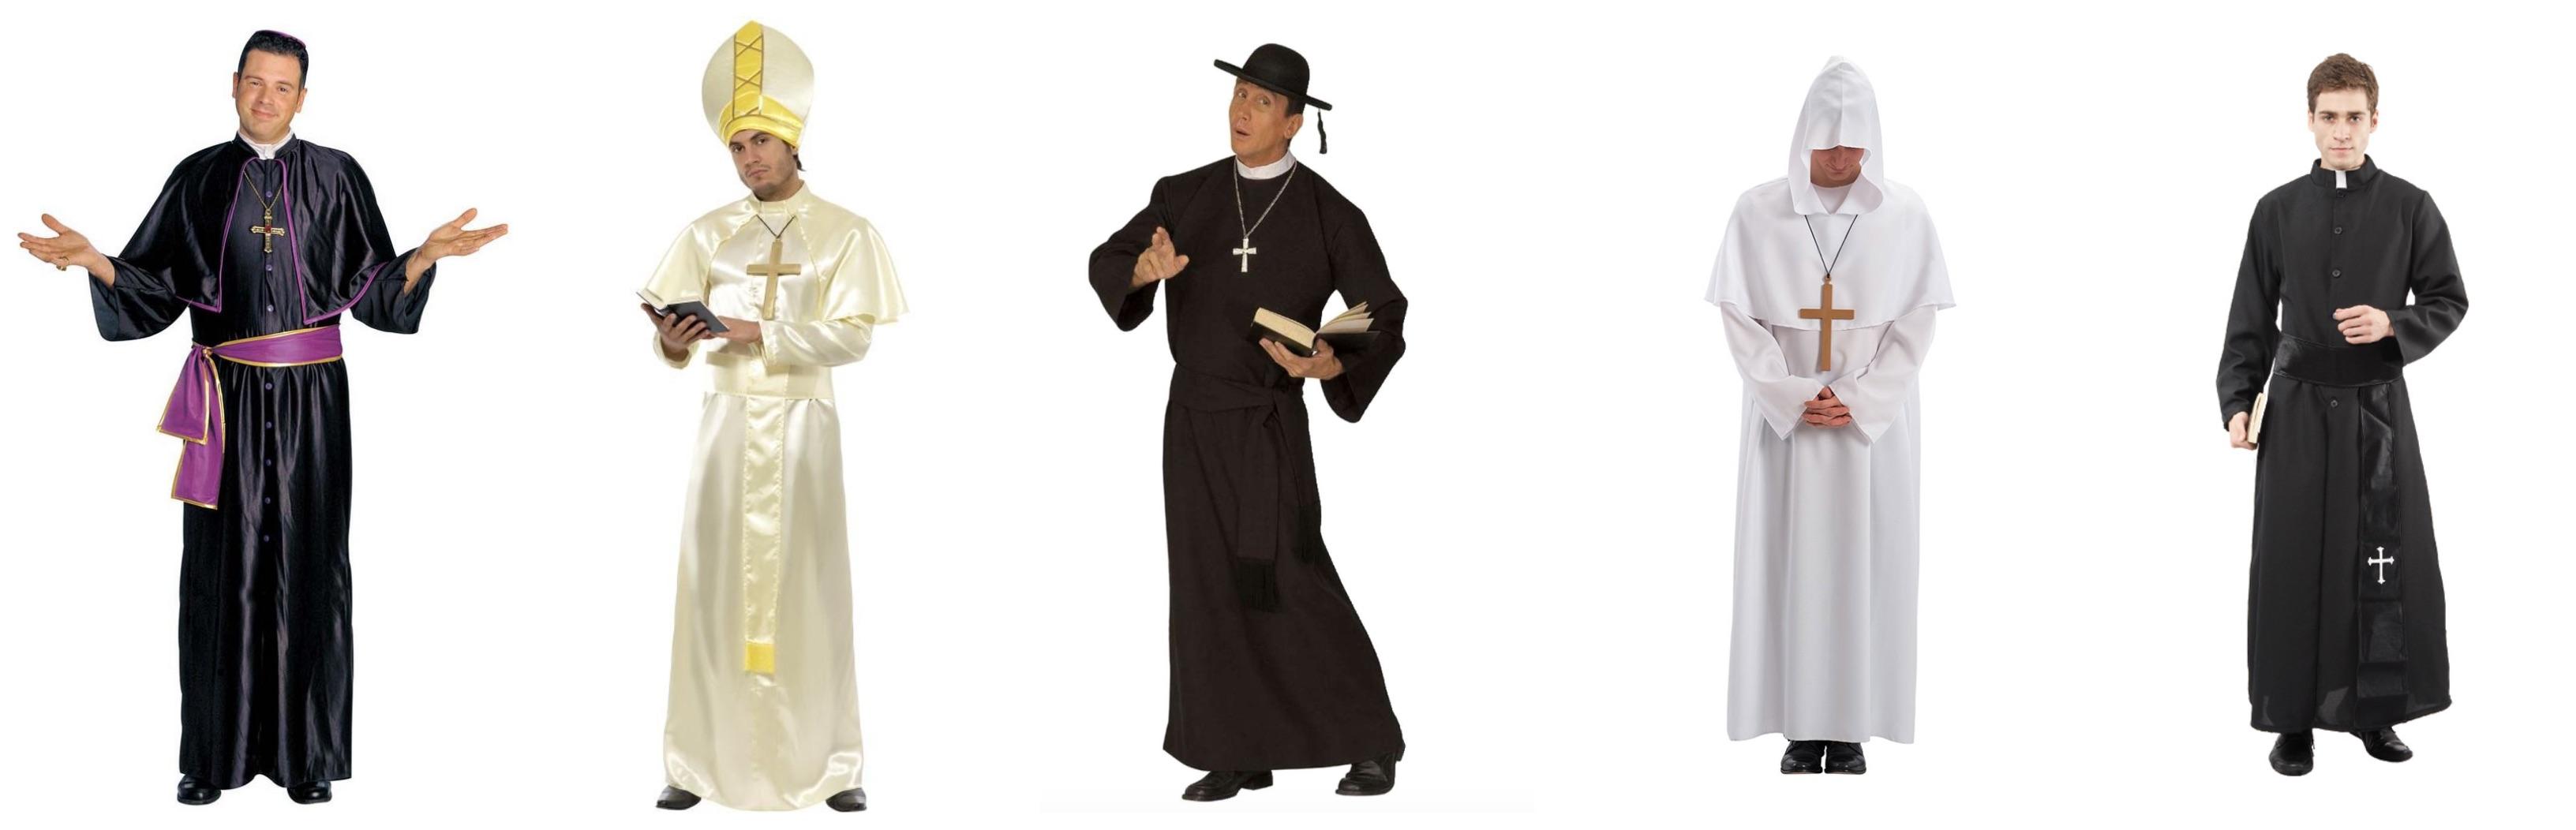 præst kostume til voksne - Præst kostume til voksne